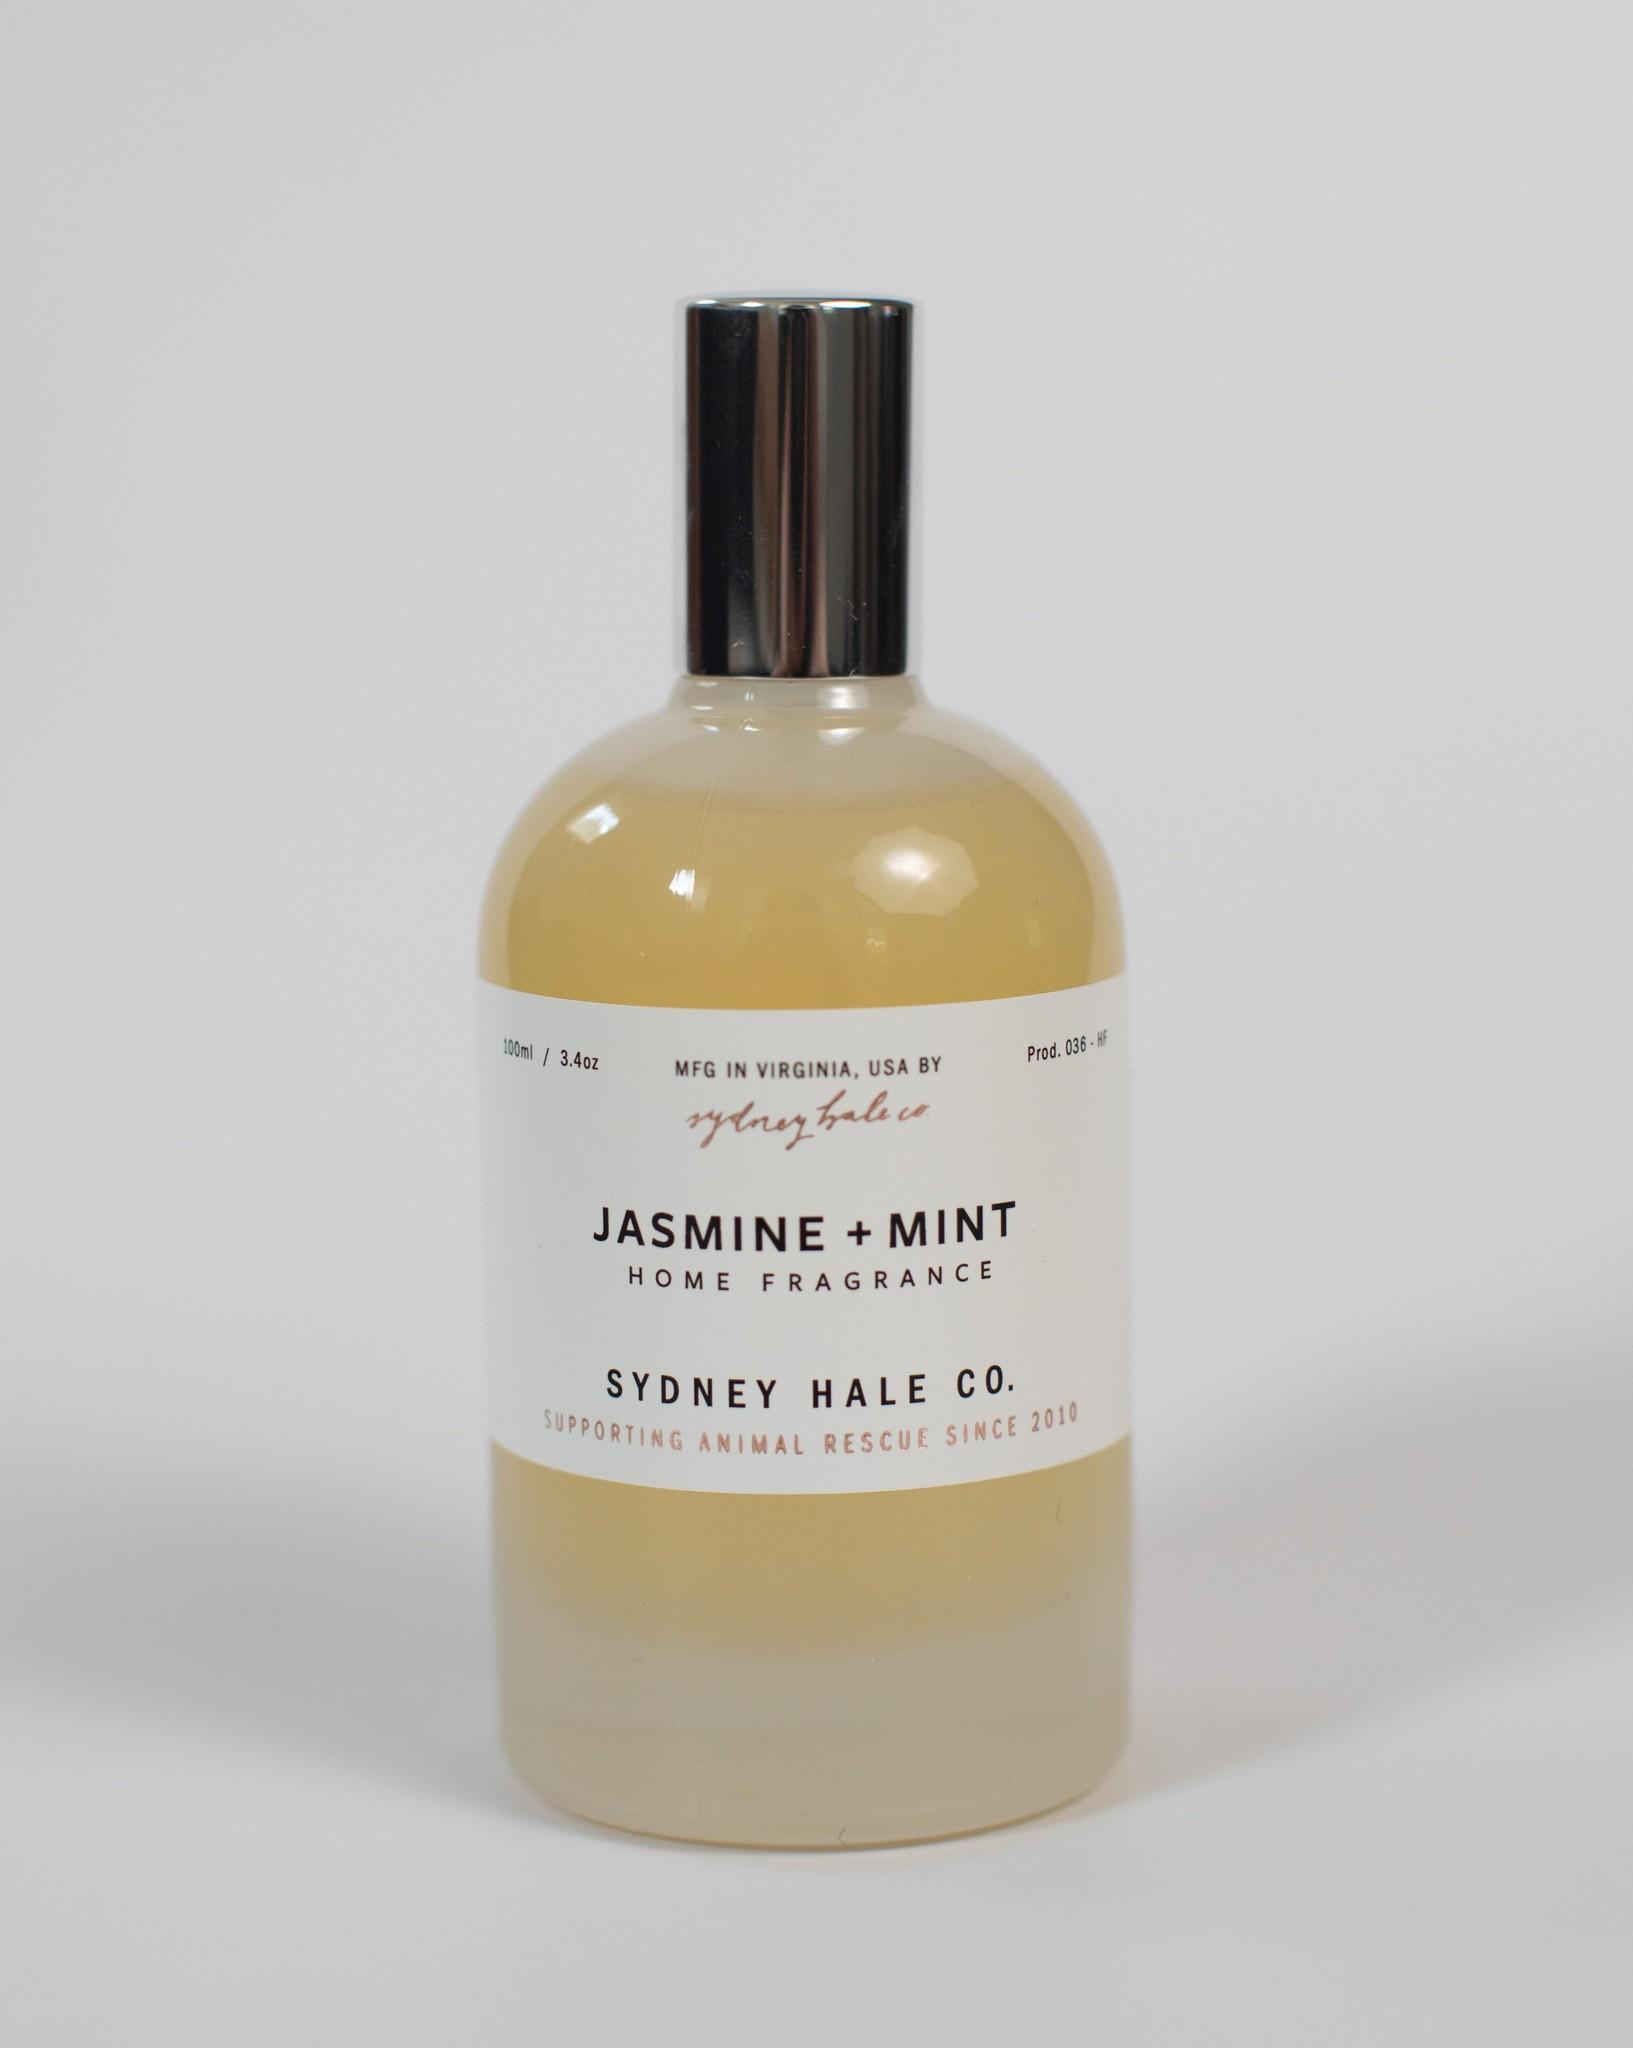 Sydney Hale Co Jasmine + Mint (3.5 oz Home Fragrance Spray)